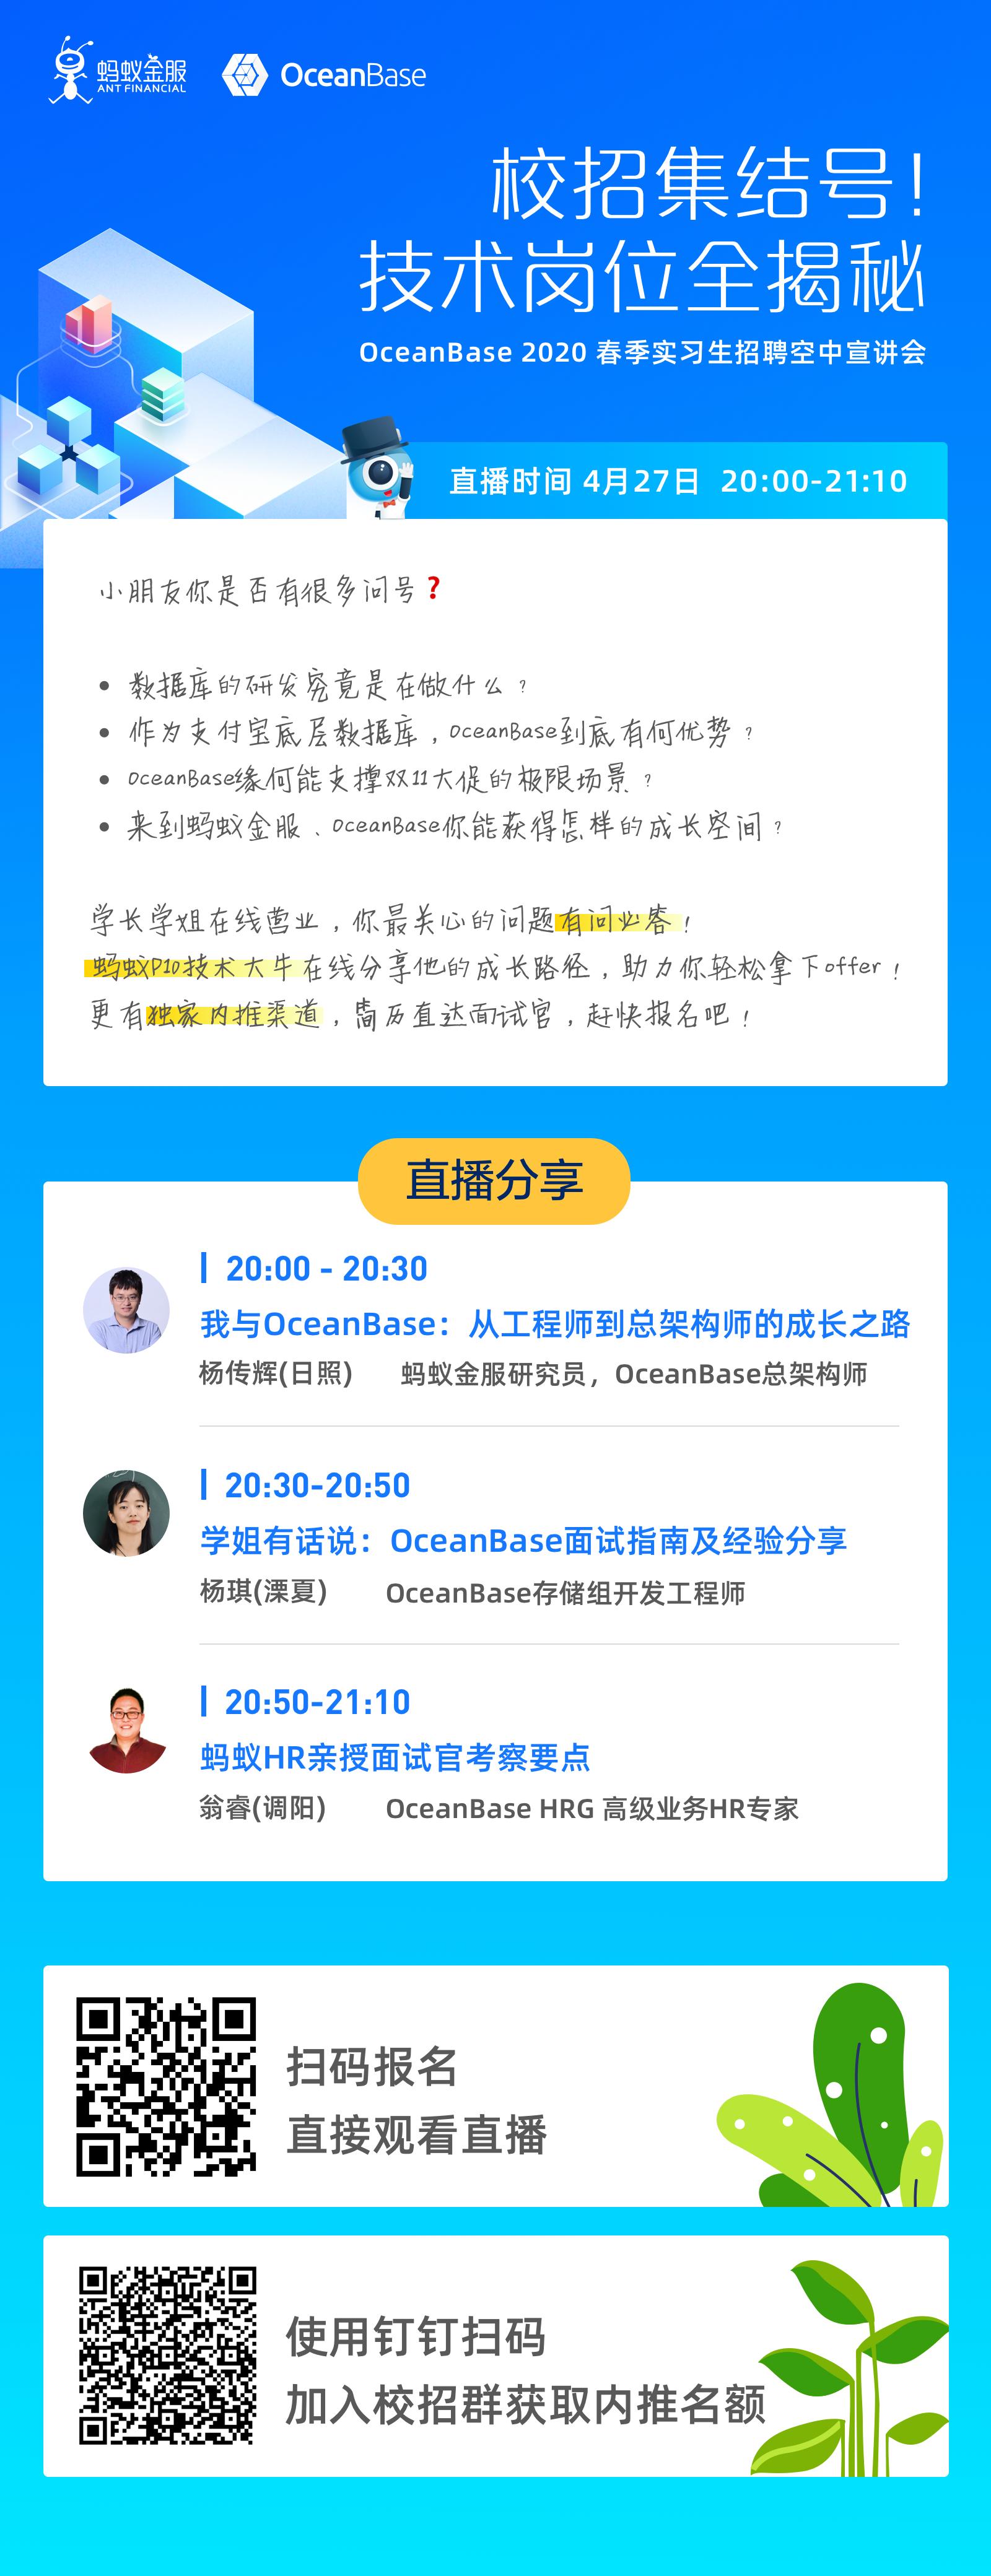 OB-招聘【有二维码】.jpg